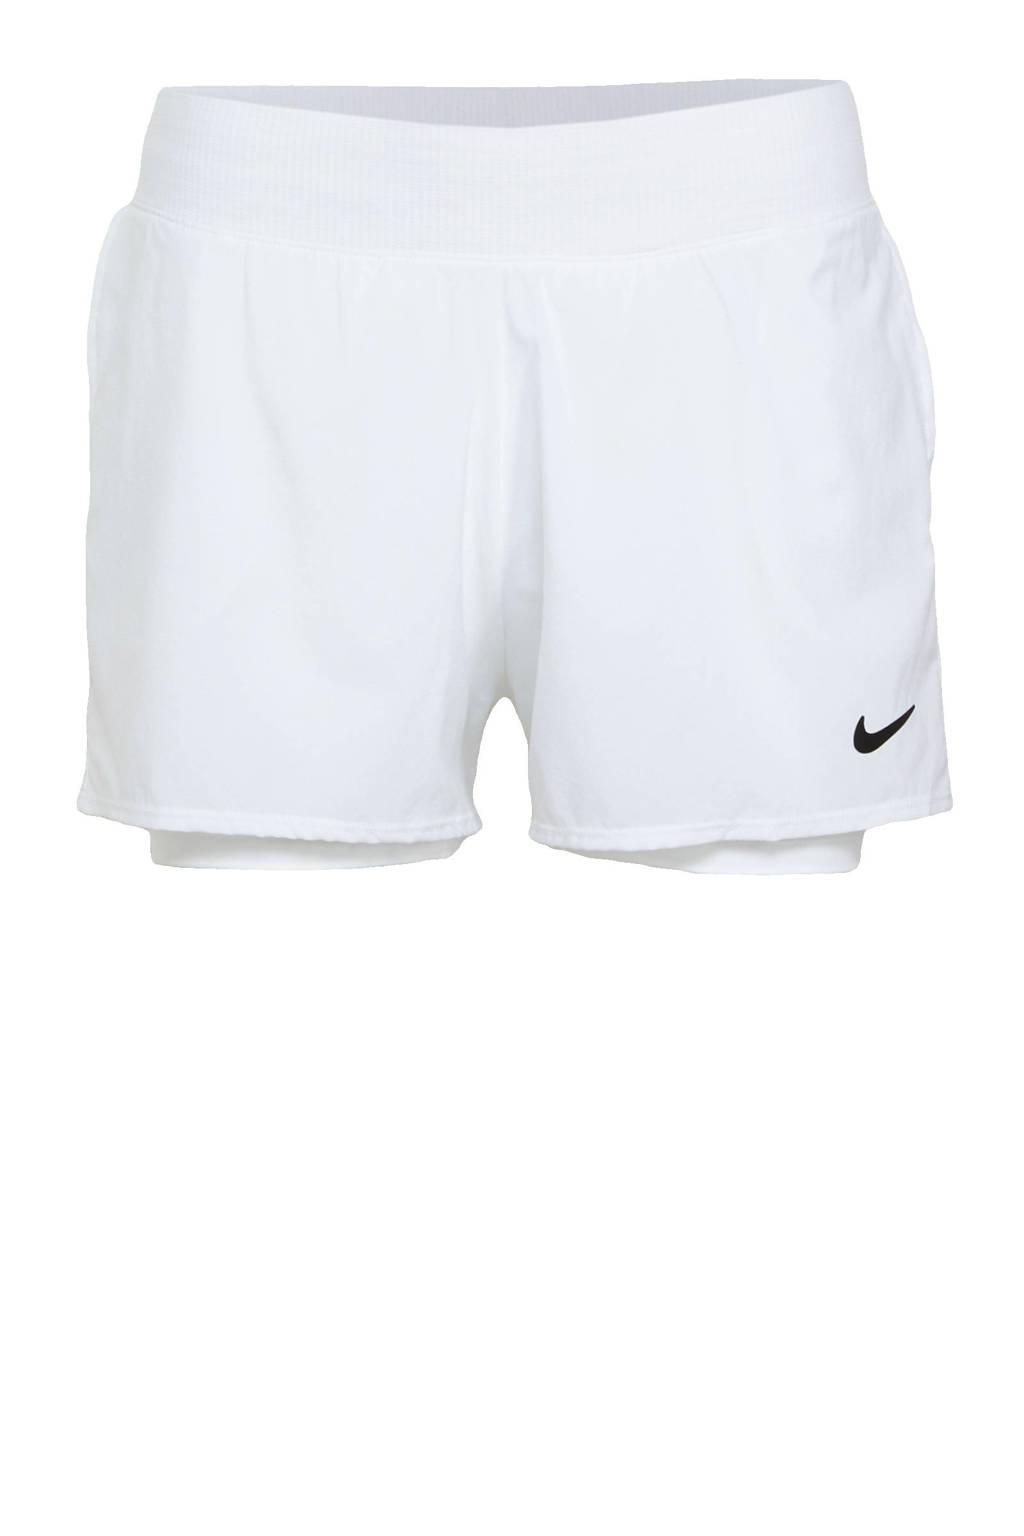 Nike sportshort wit, Wit